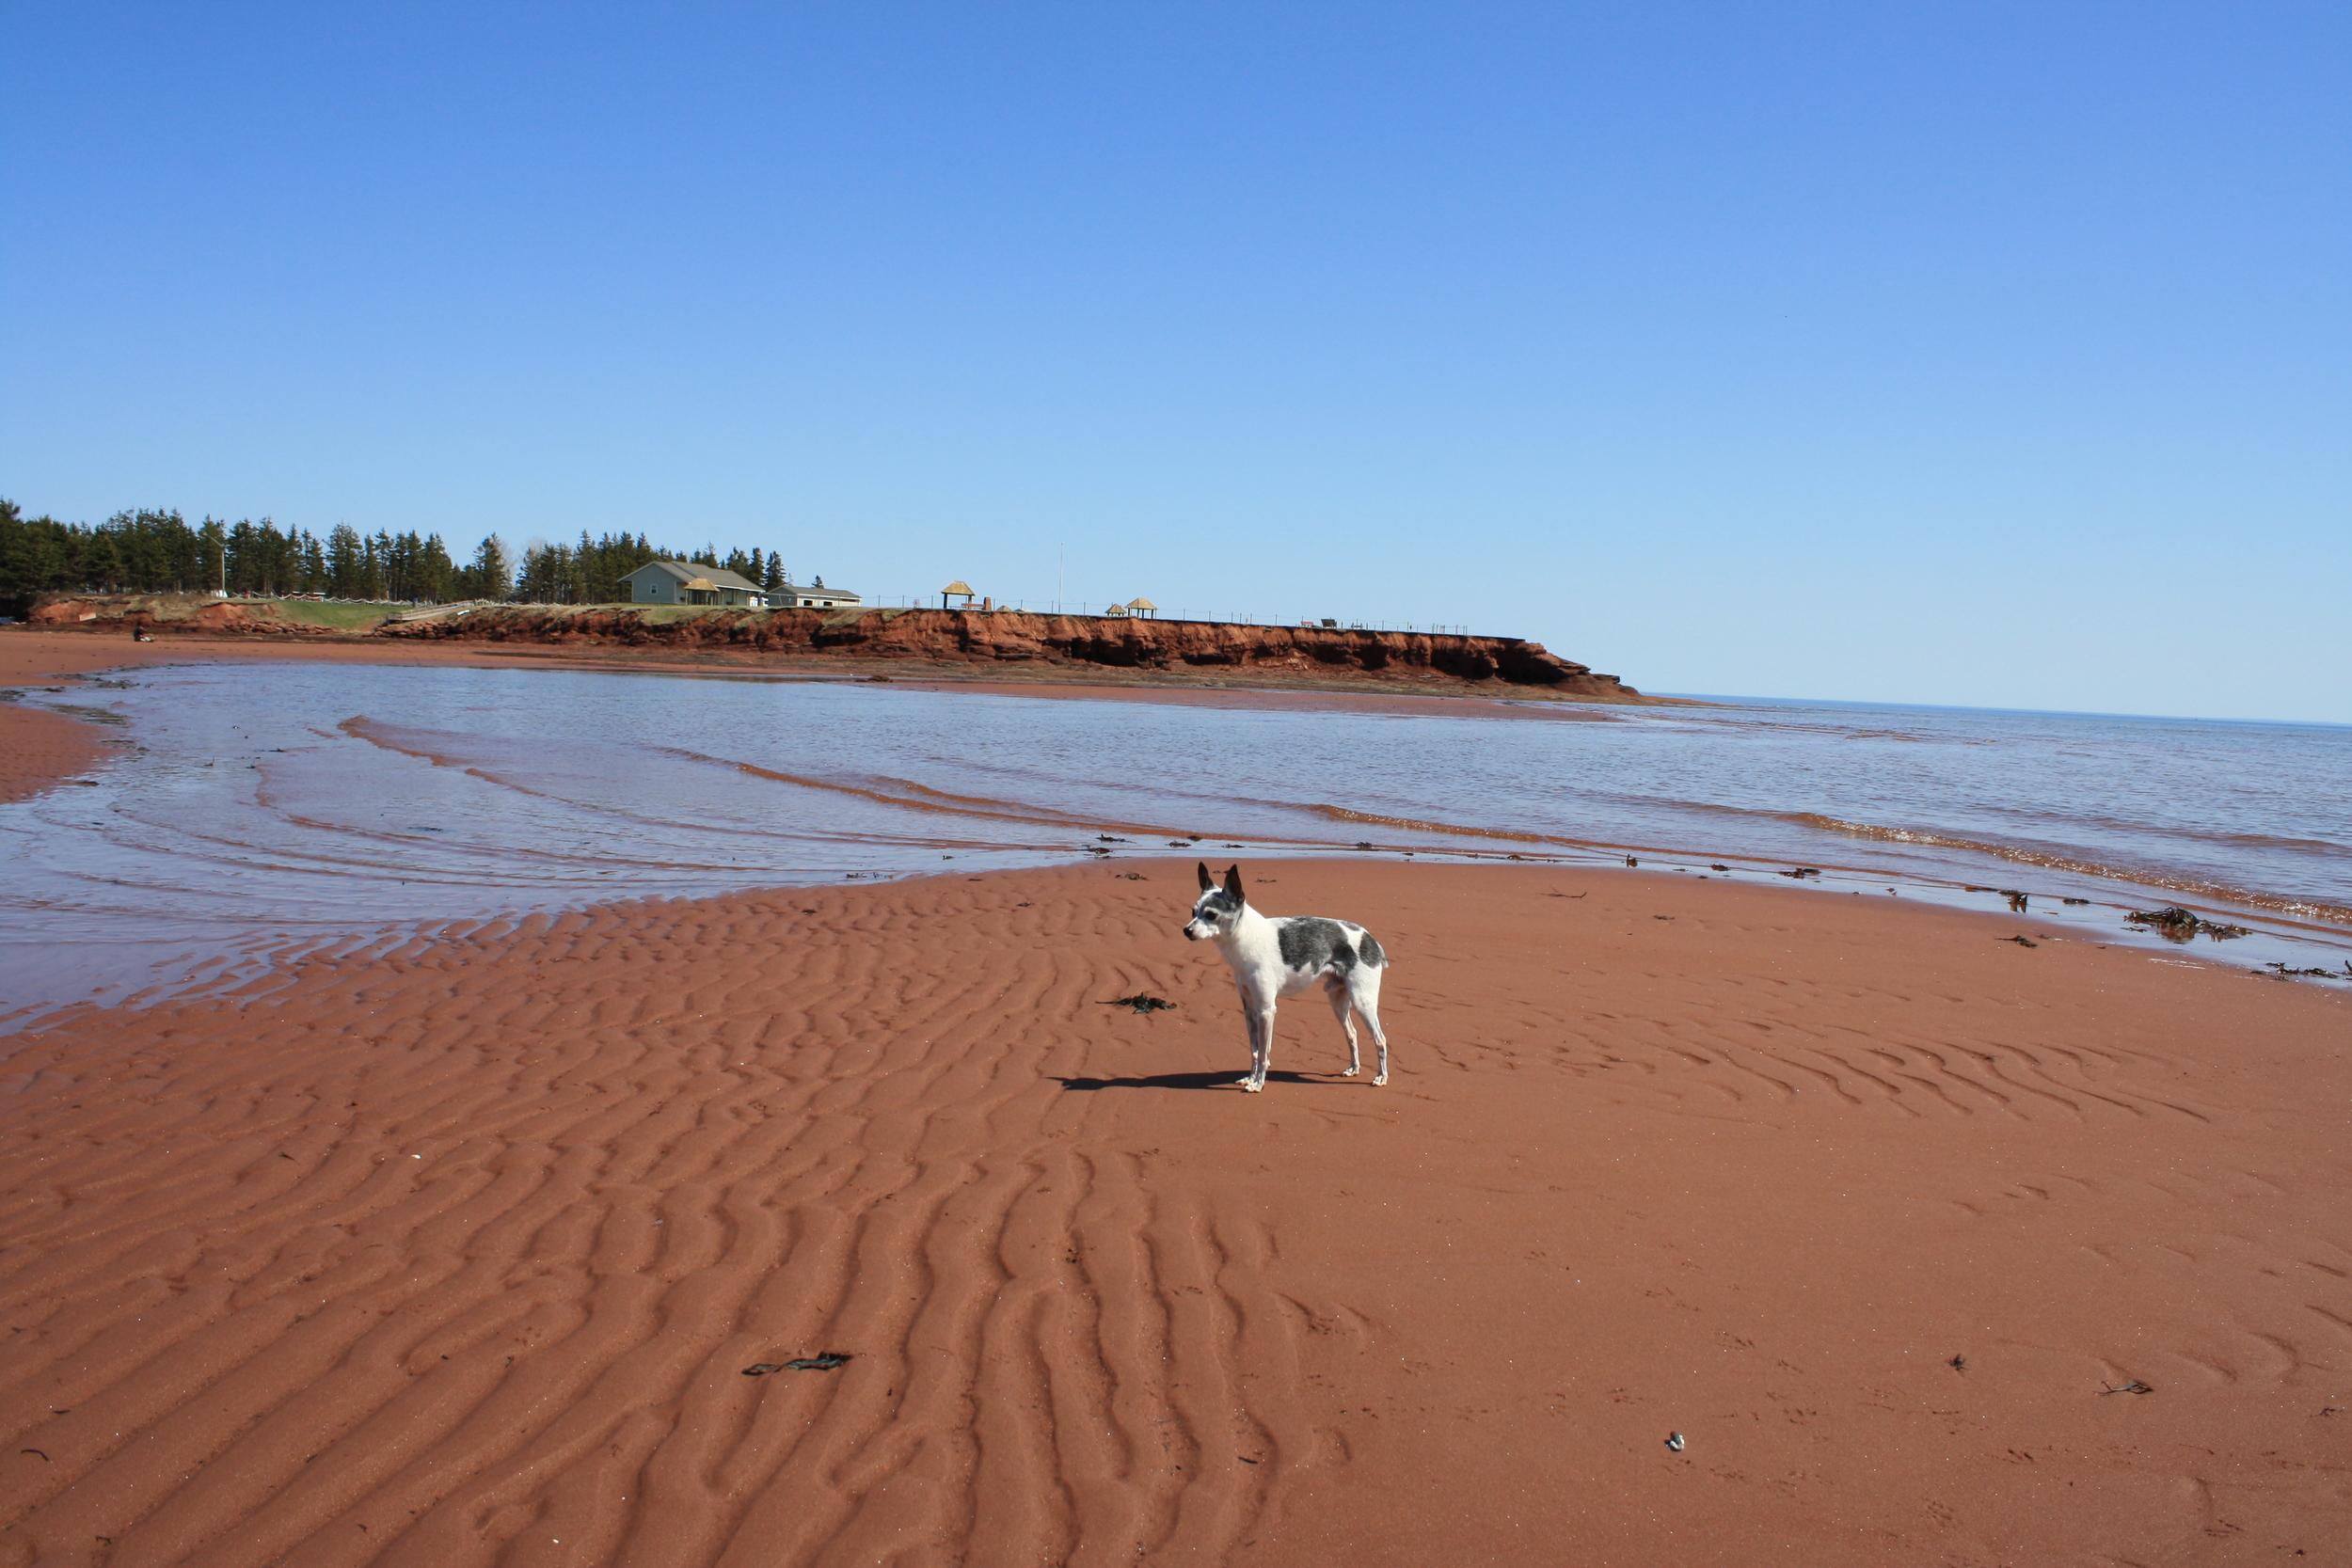 Santosh meets the Red Sand of Canoe Cove, P.E.I.